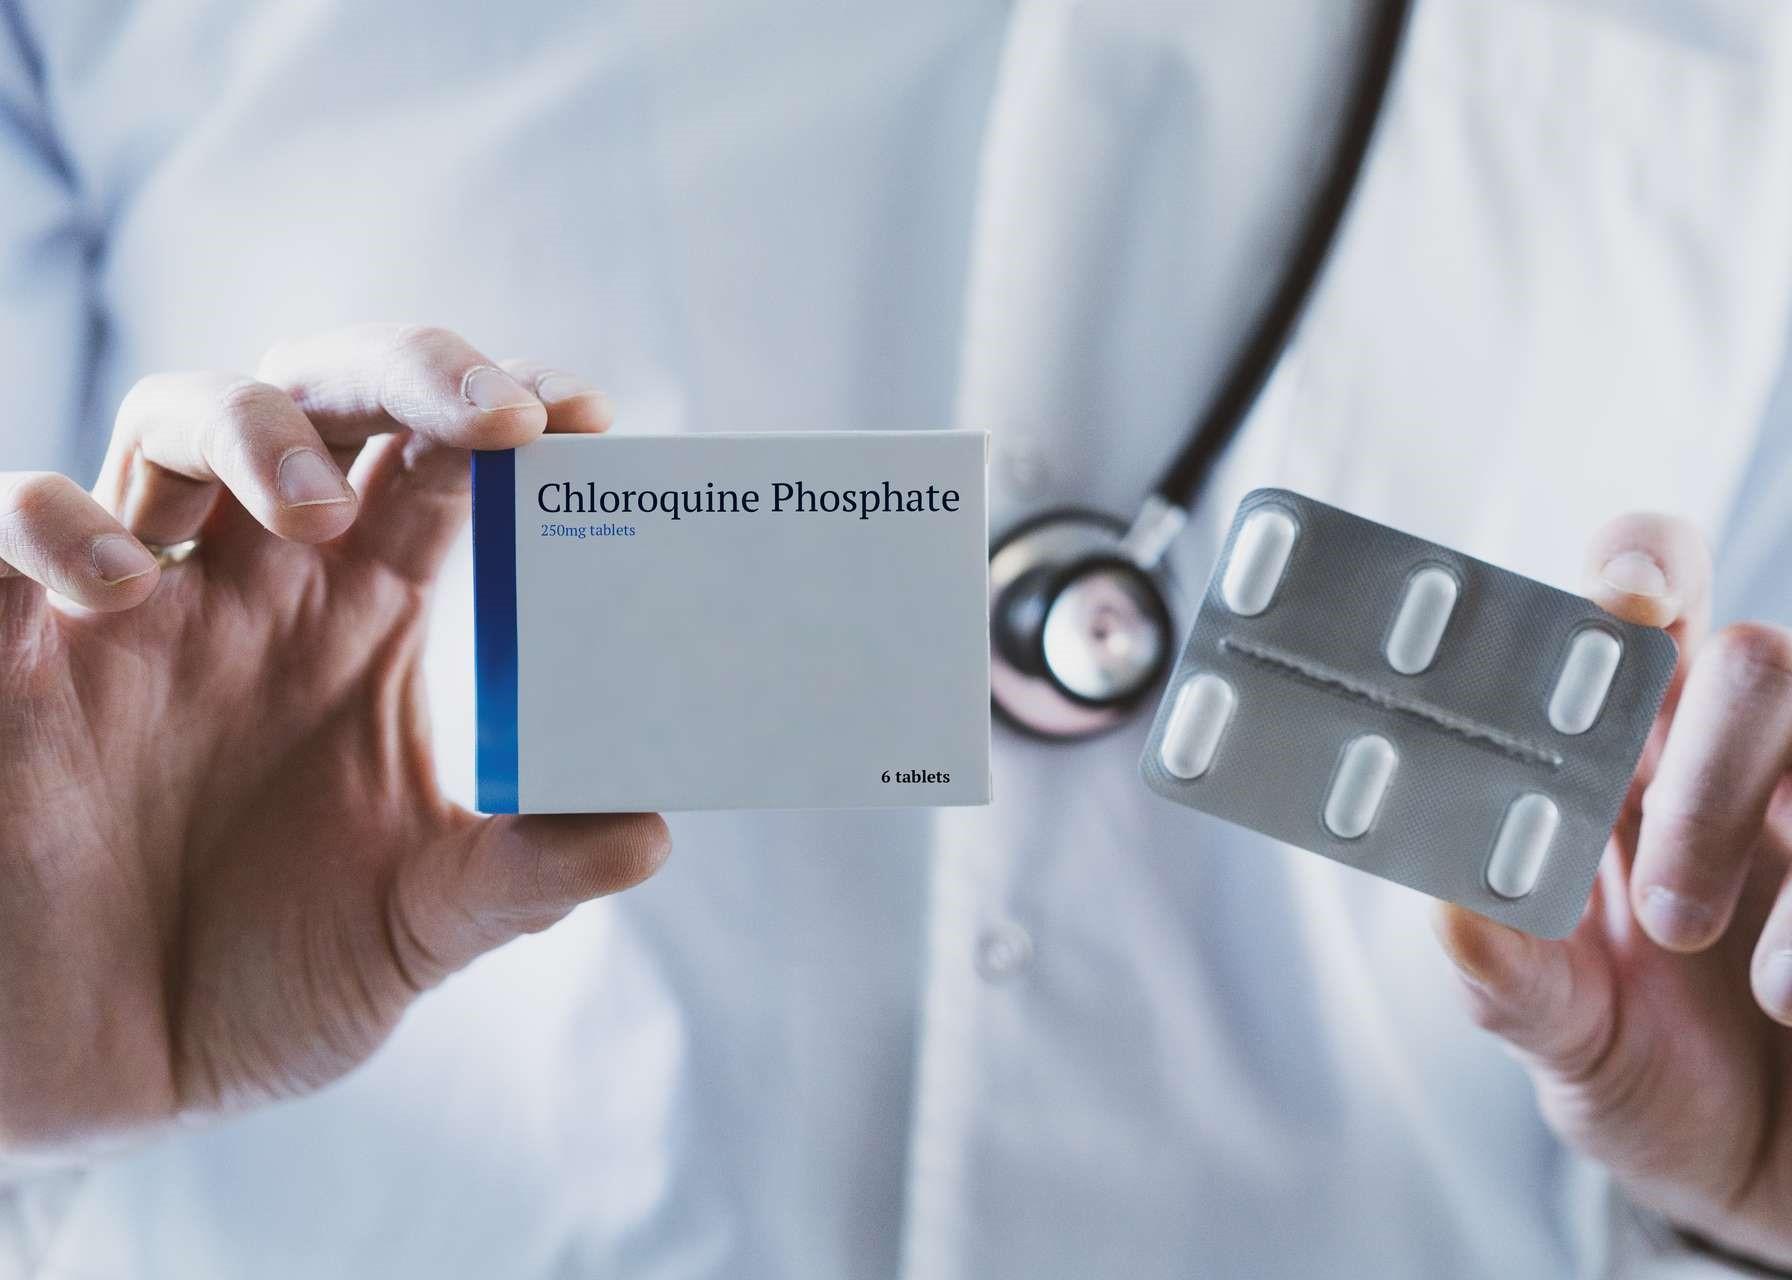 Coronavirus: Le Maroc recevra de l'hydroxychloroquine en provenance de l'Inde